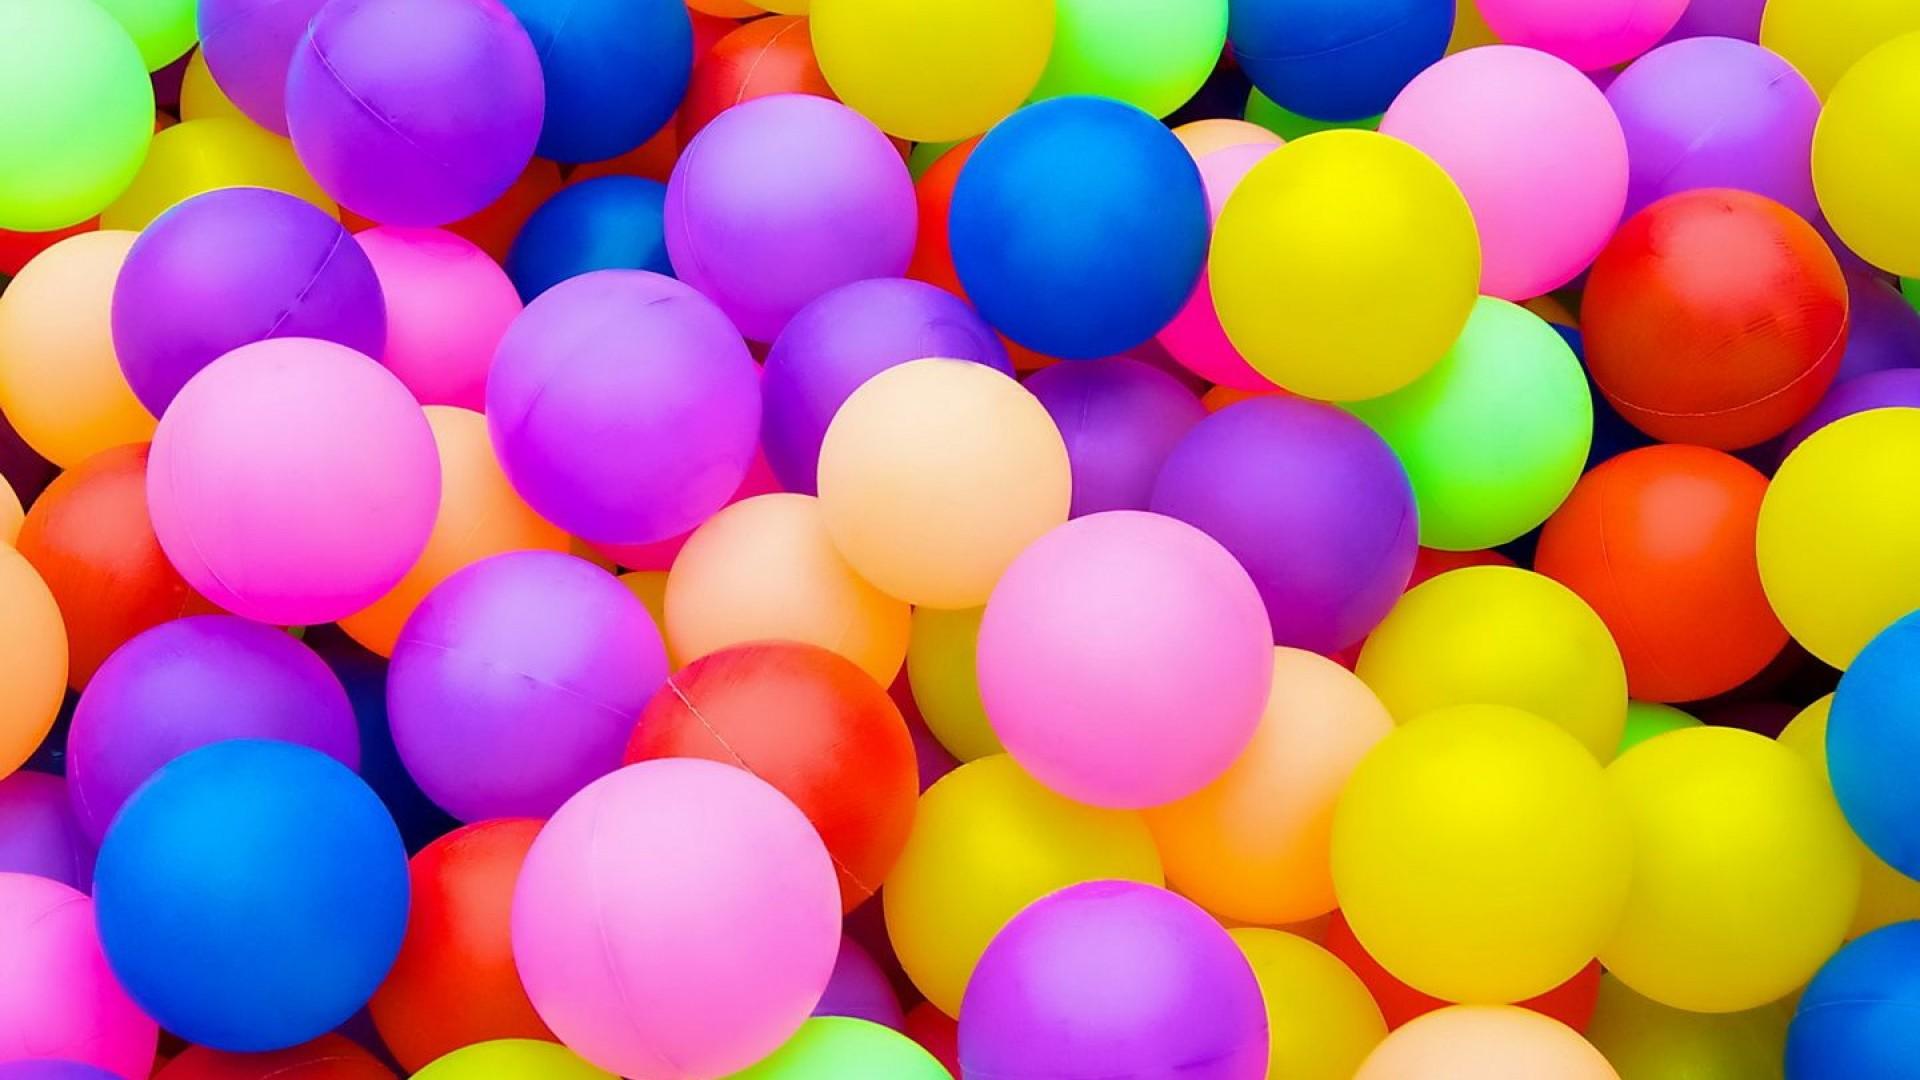 Colourful Birthday Balloons HD Wallpaper 1920x1080